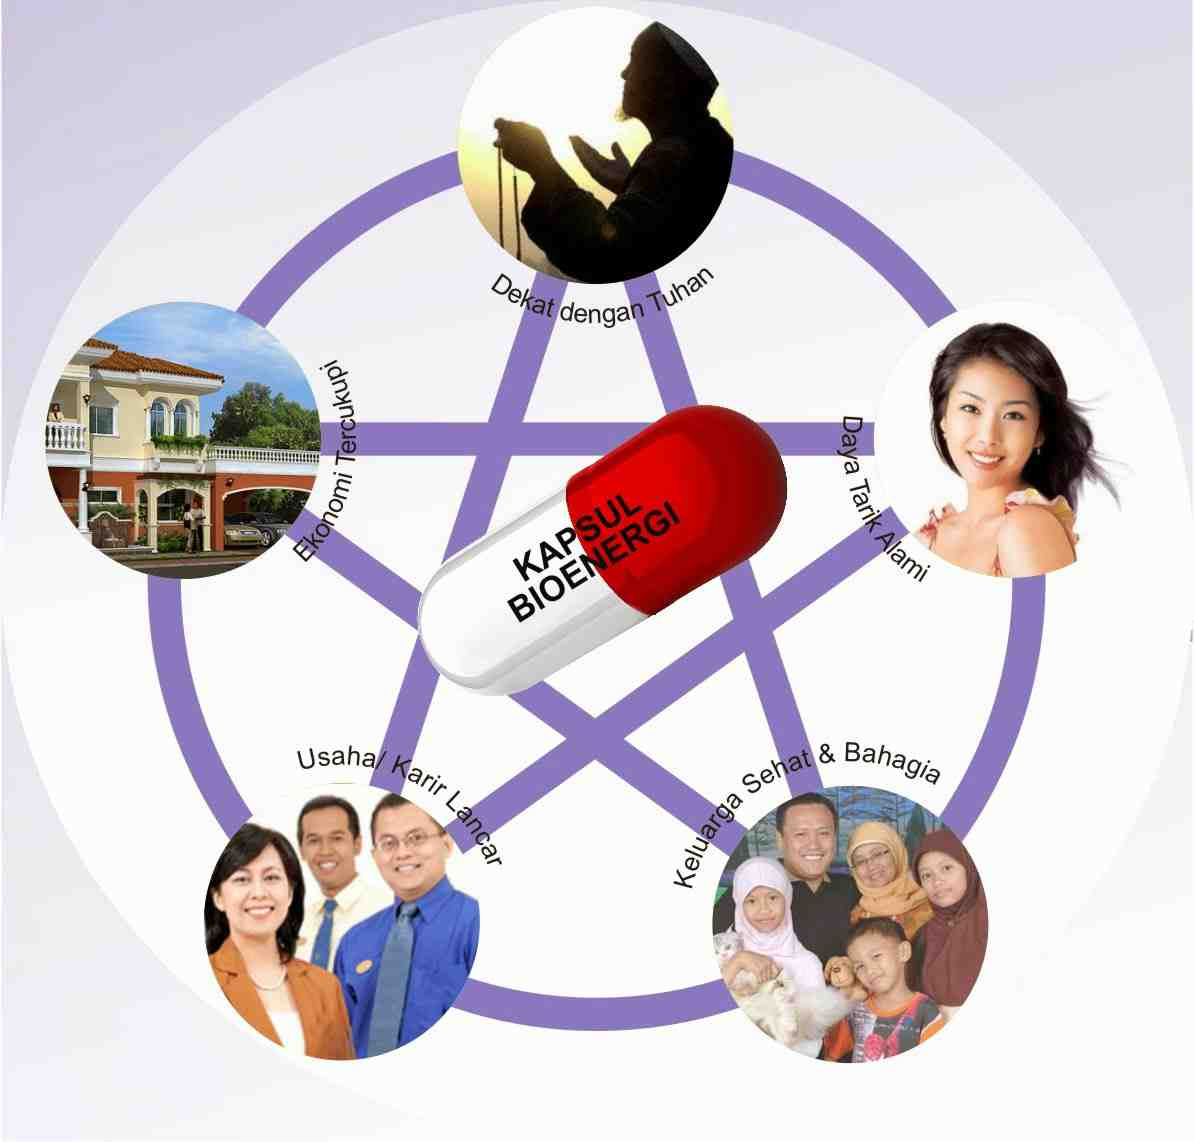 Solusi Masalah, Cara Menghadapi Masalah, Mengatasi Masalah, Solusi Rumah Tangga, bayar hutang